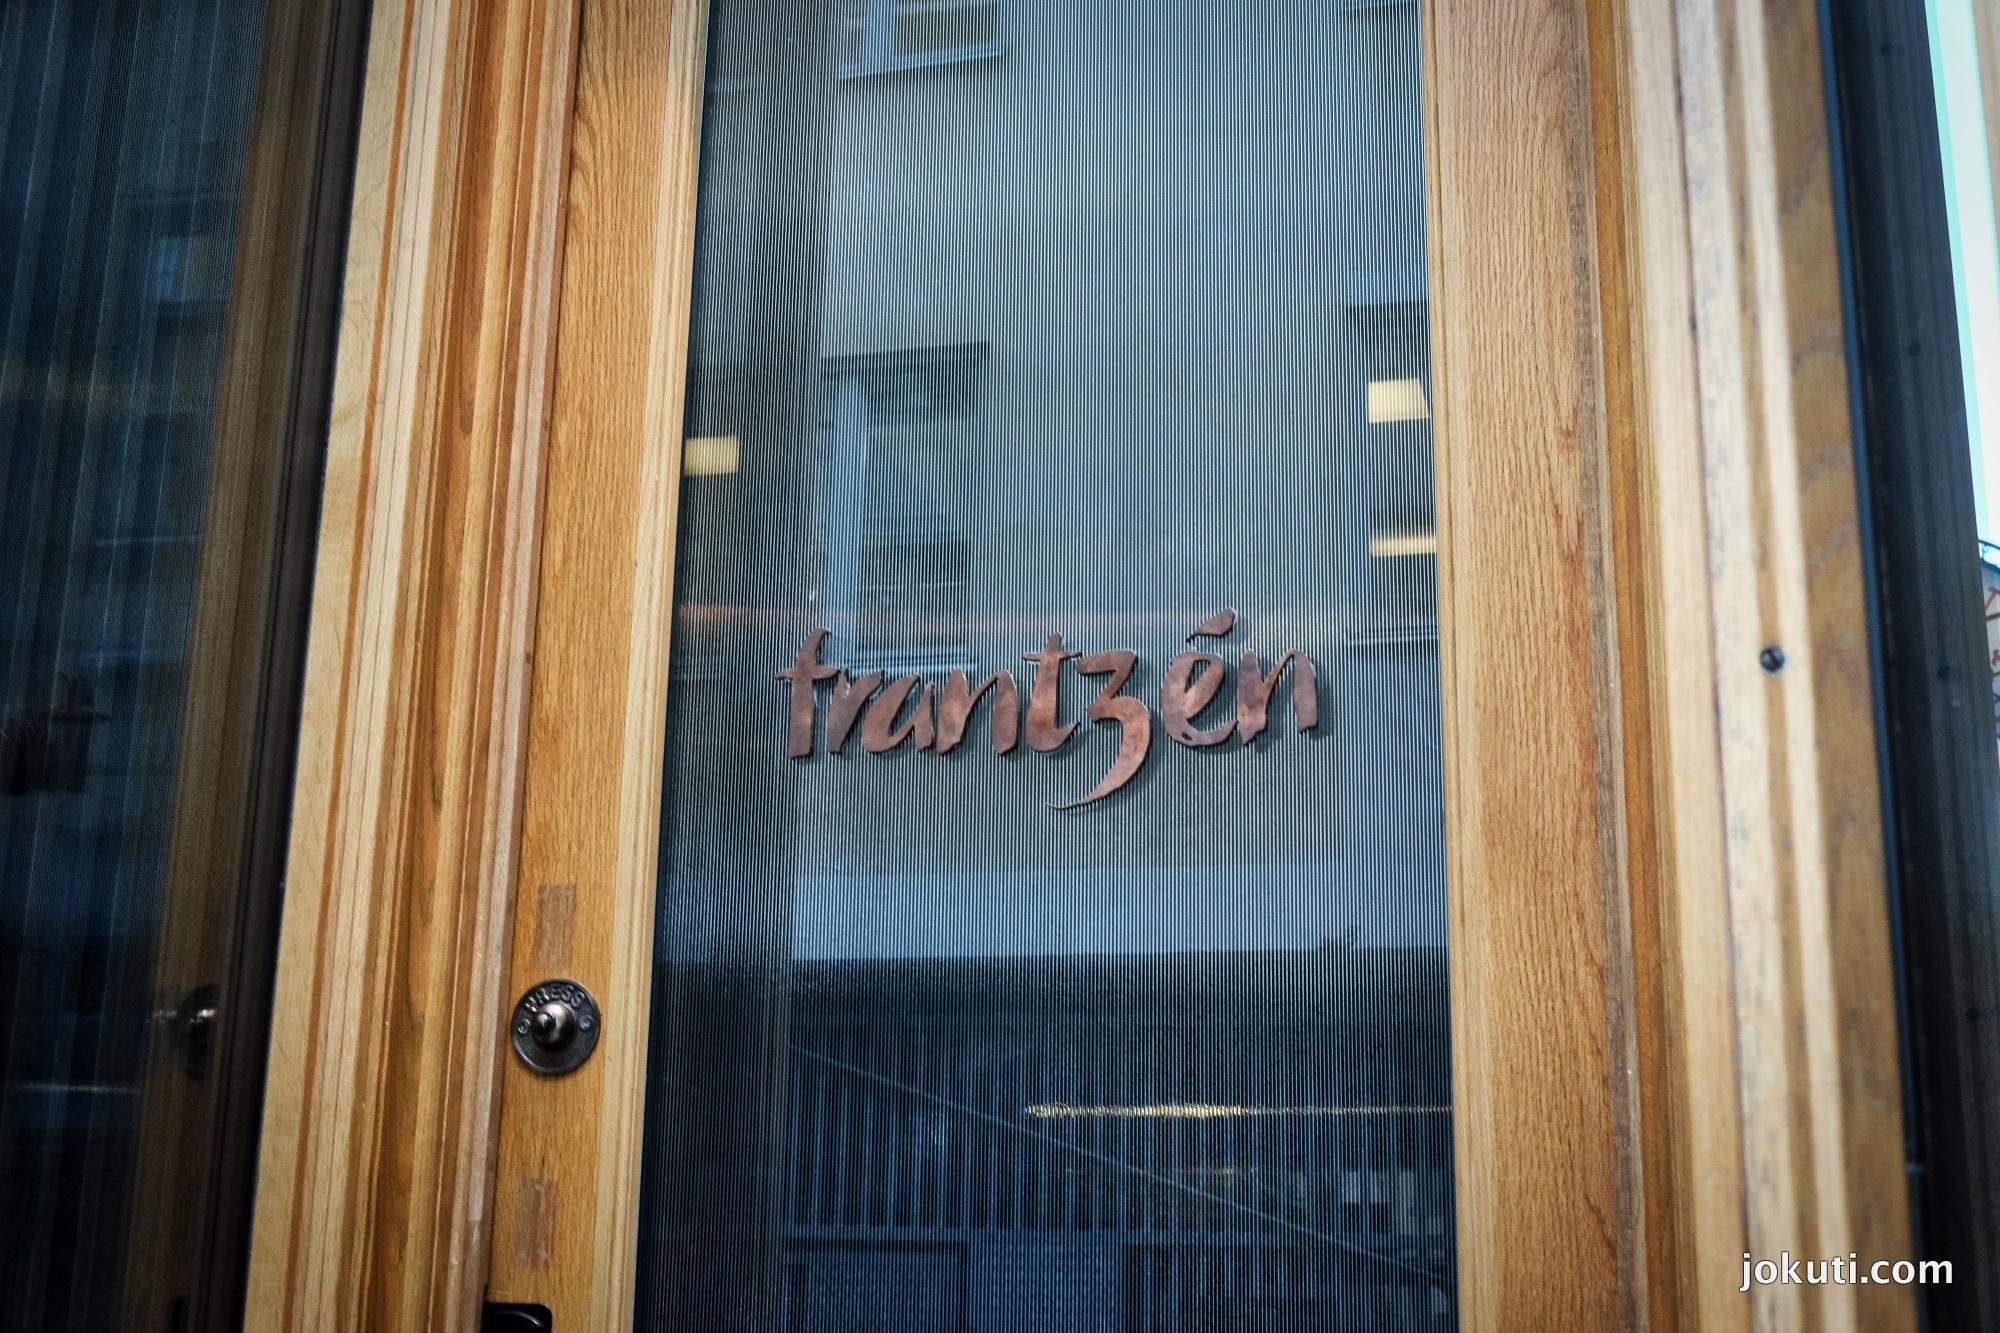 dscf5337_frantzen_stockholm_restaurant_michelin_stars_sweden_vilagevo_jokuti_l.jpg